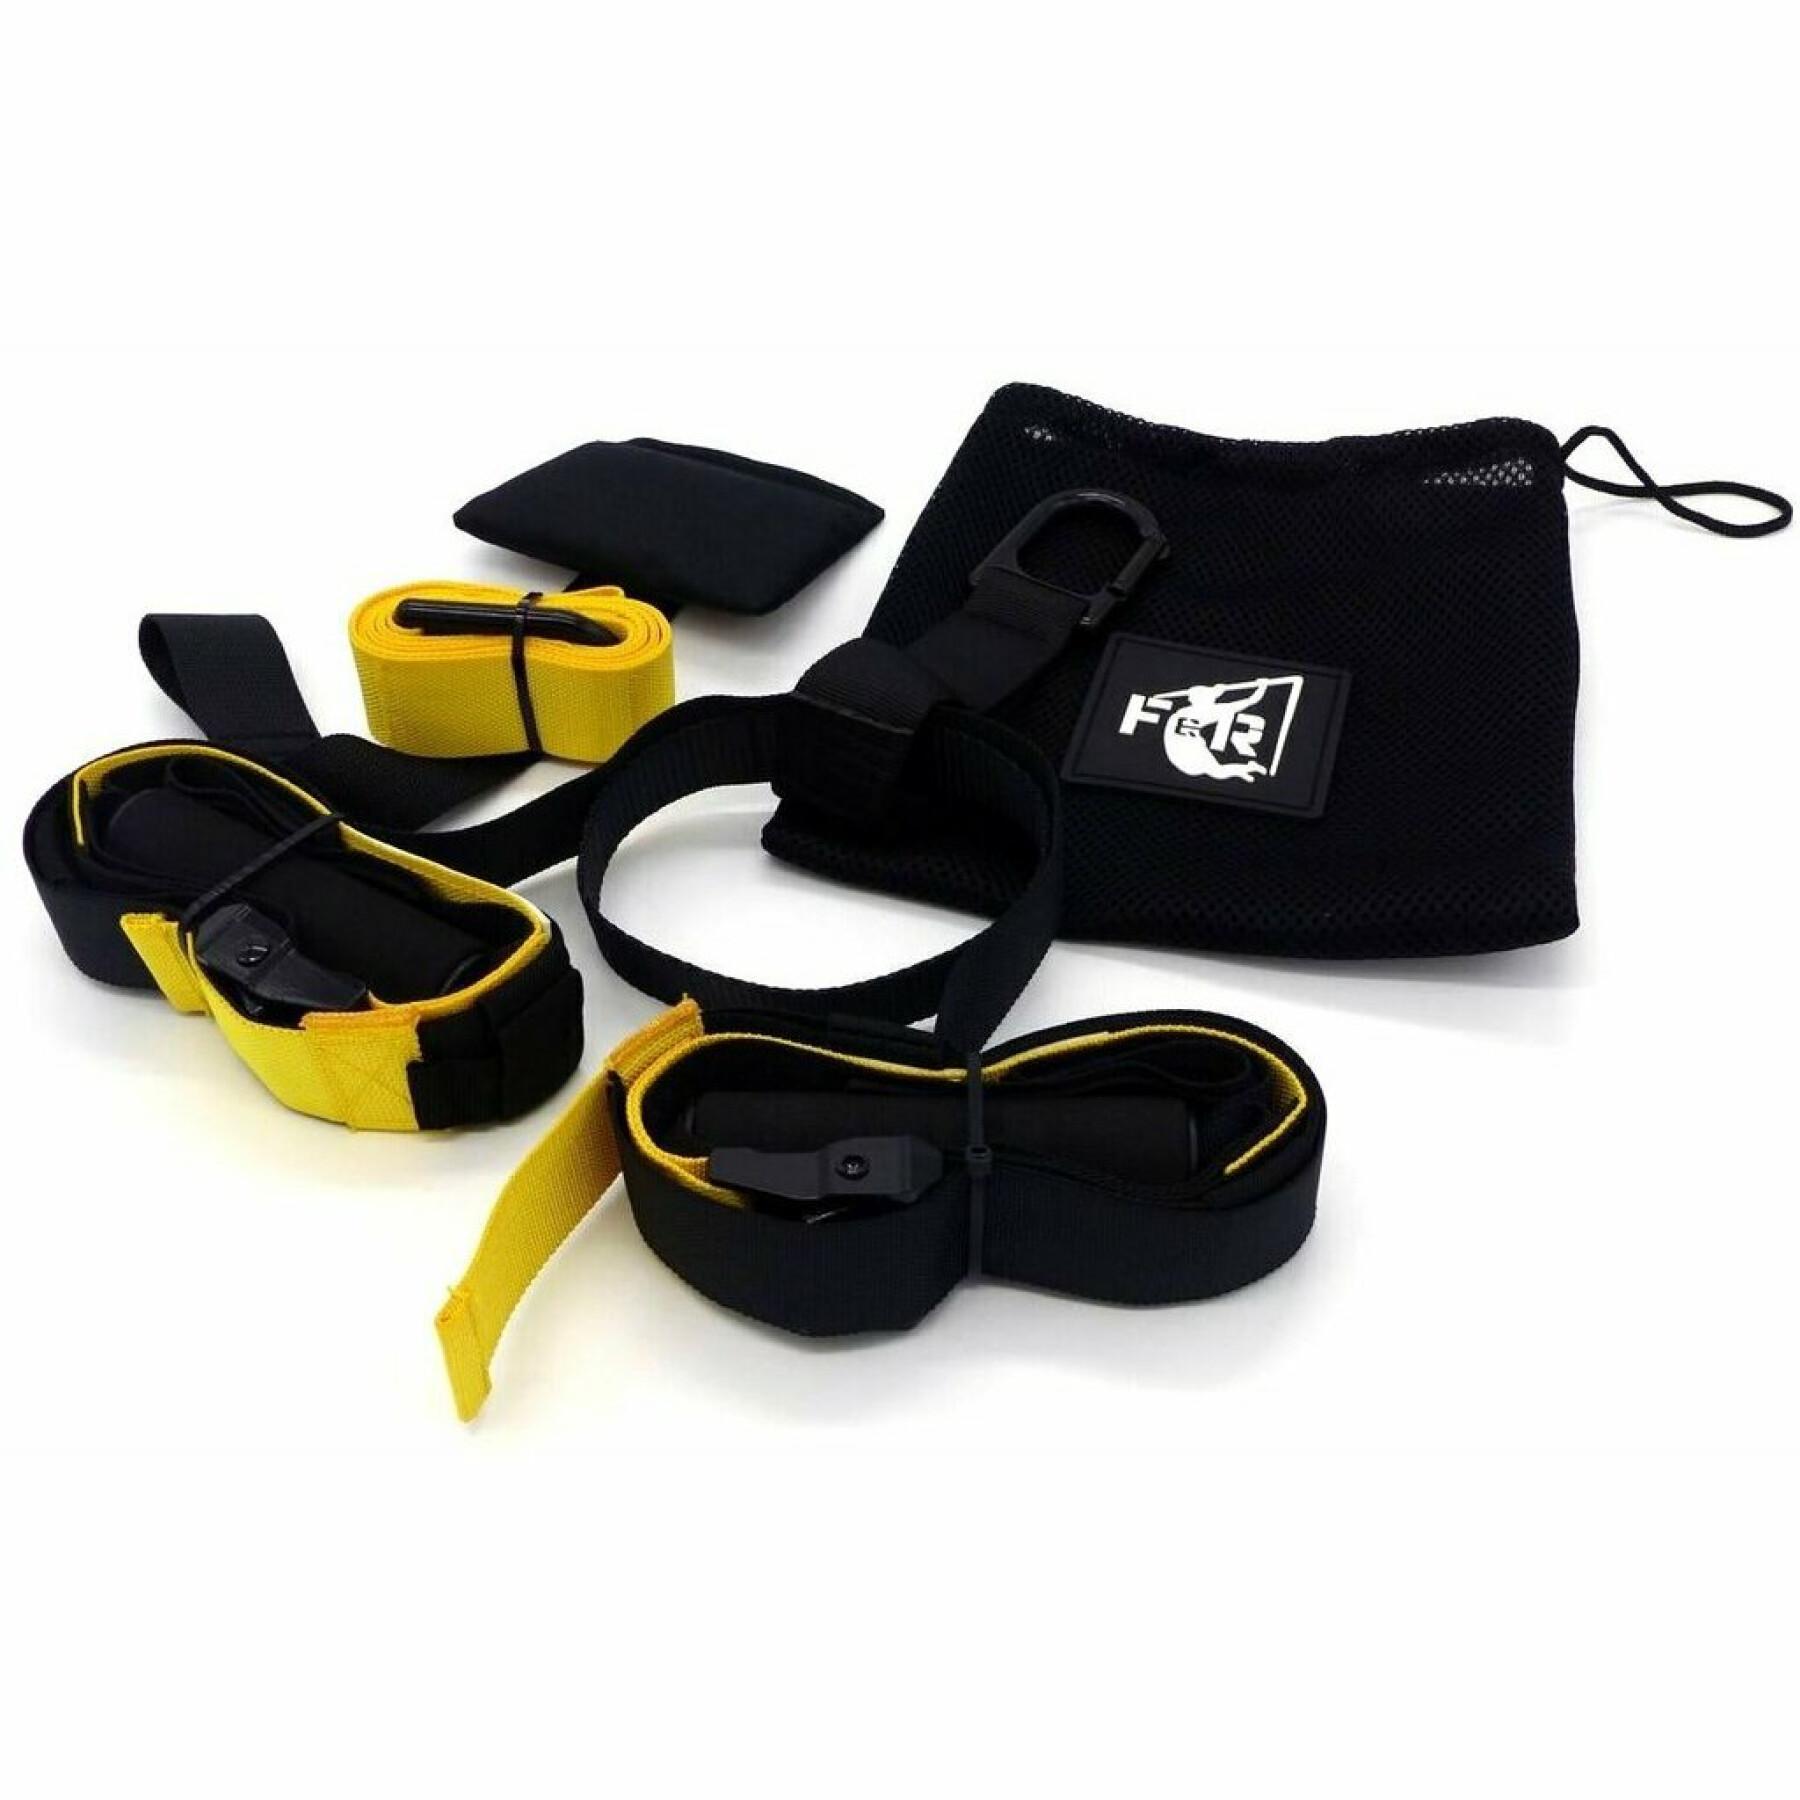 Suspension strap Fit & Rack Training